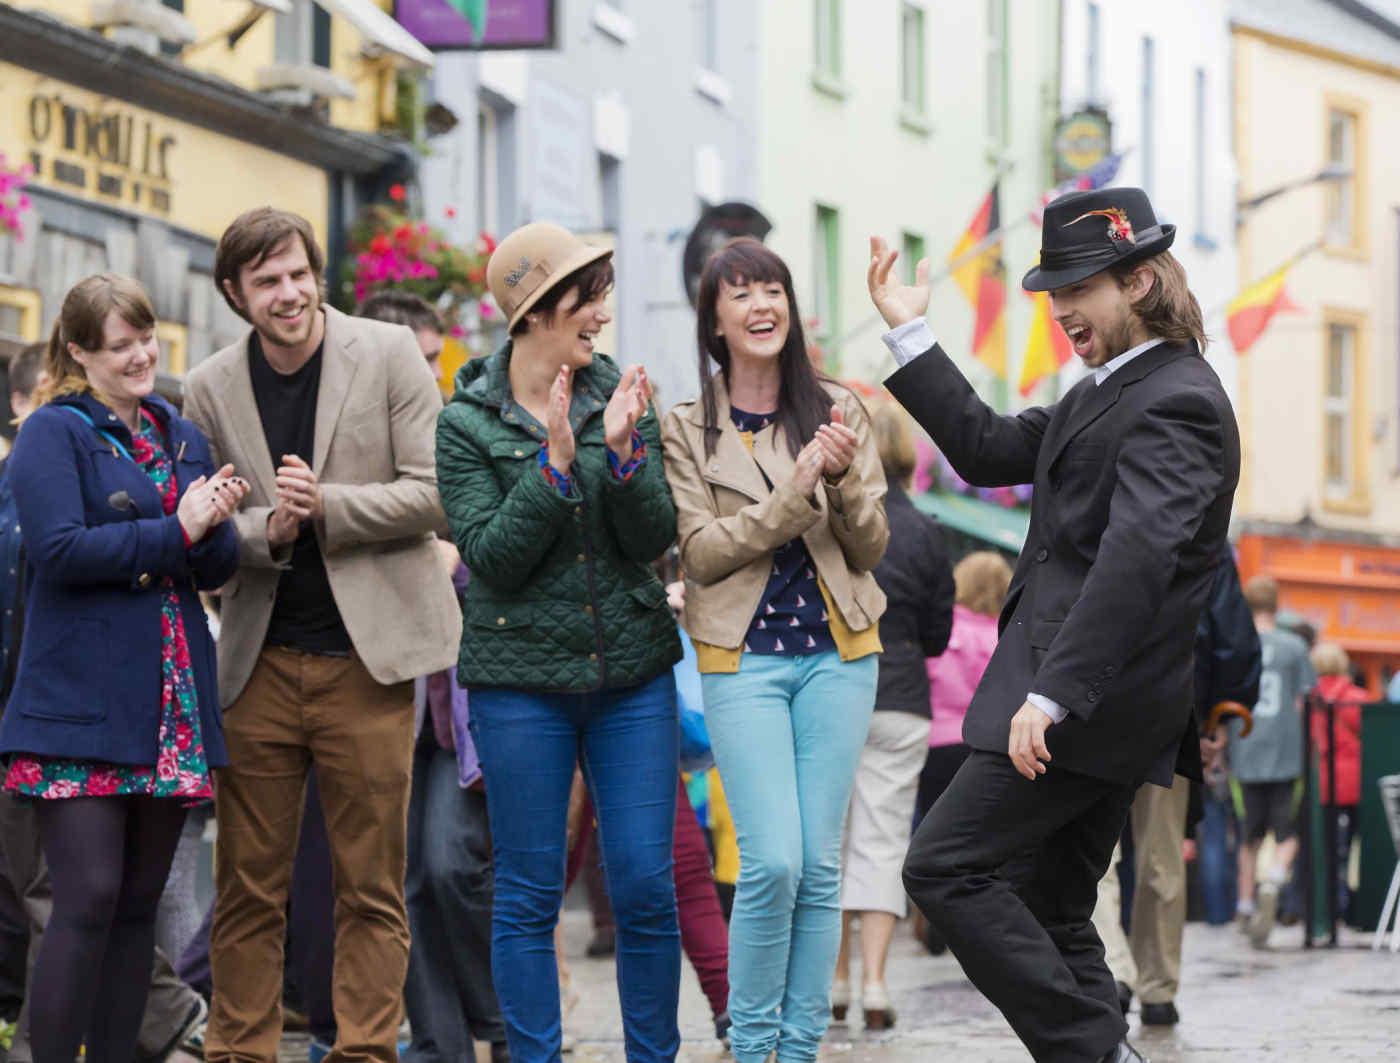 Galway City, Ireland